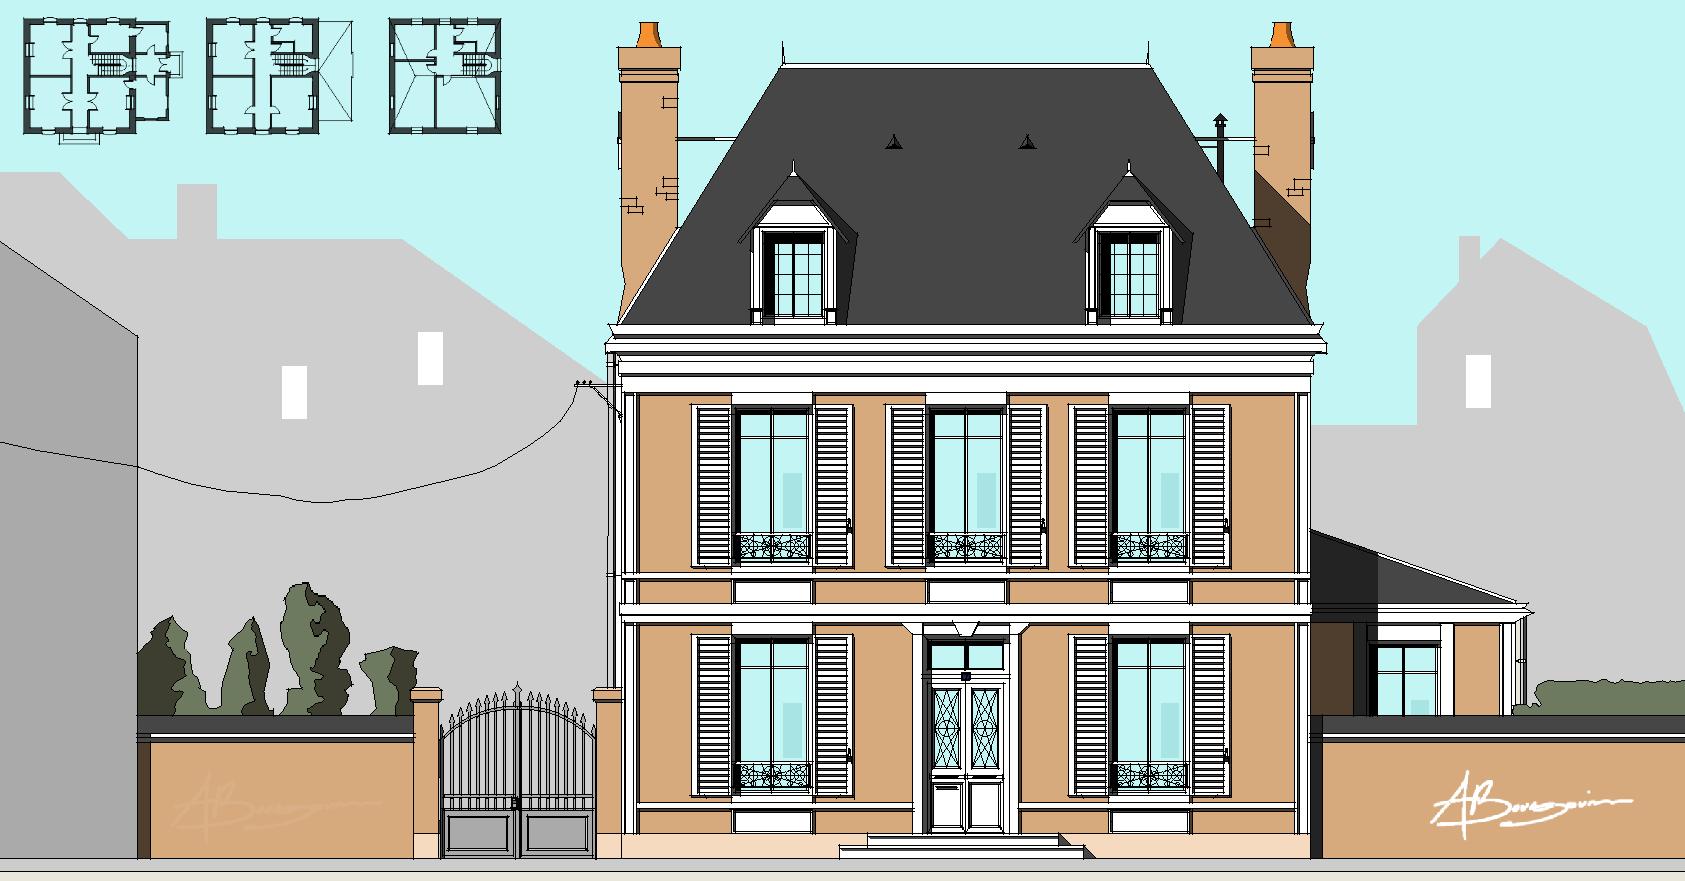 SketchUp'eur architecte -AnthO'- - Page 29 30bis210